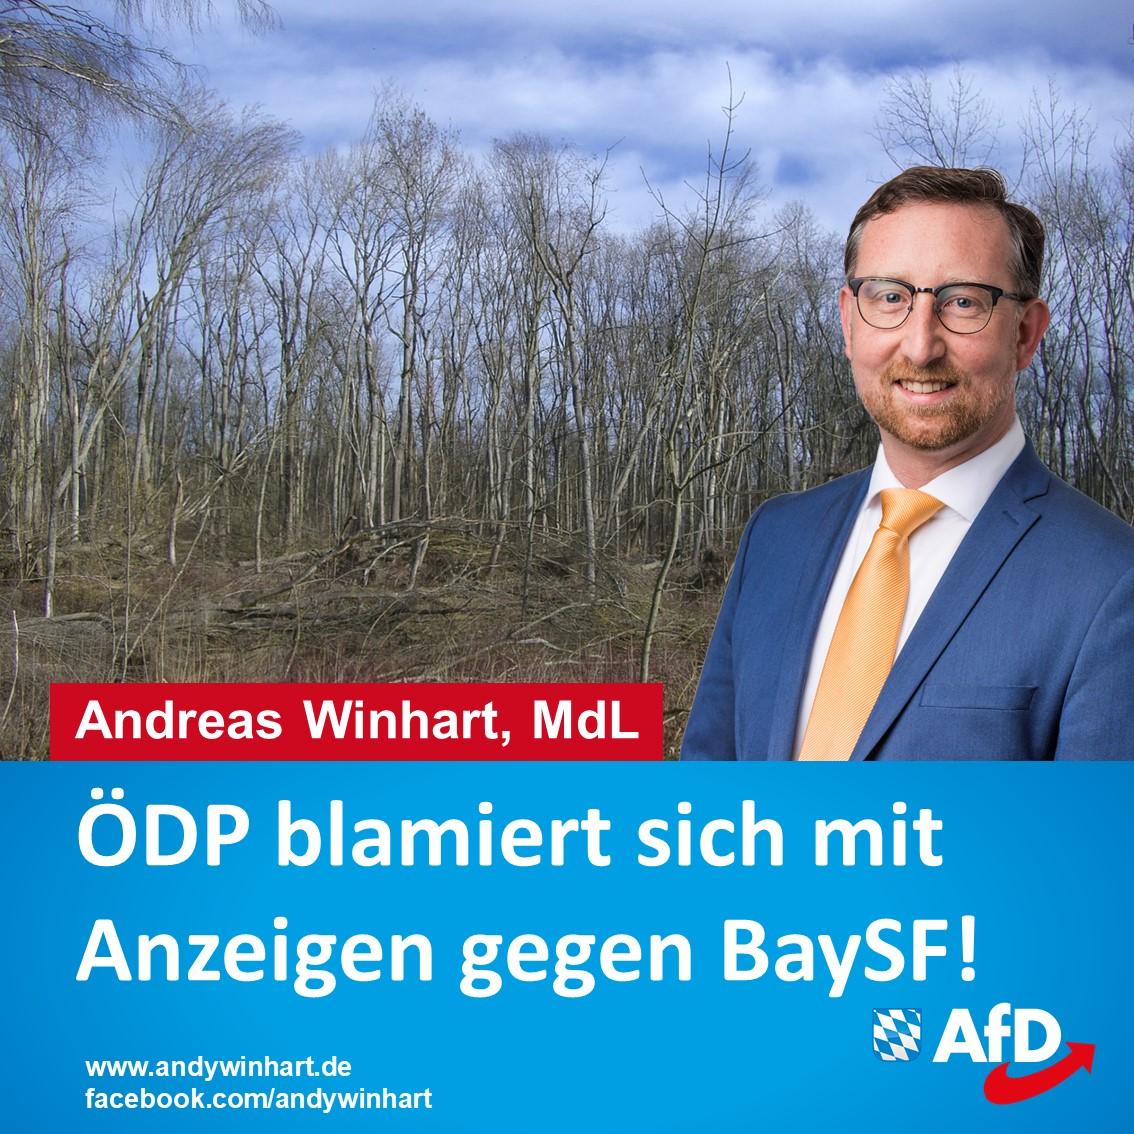 AfD-Landtagsabgeordneter kritisiert ÖDP Anzeige gegen BaySF